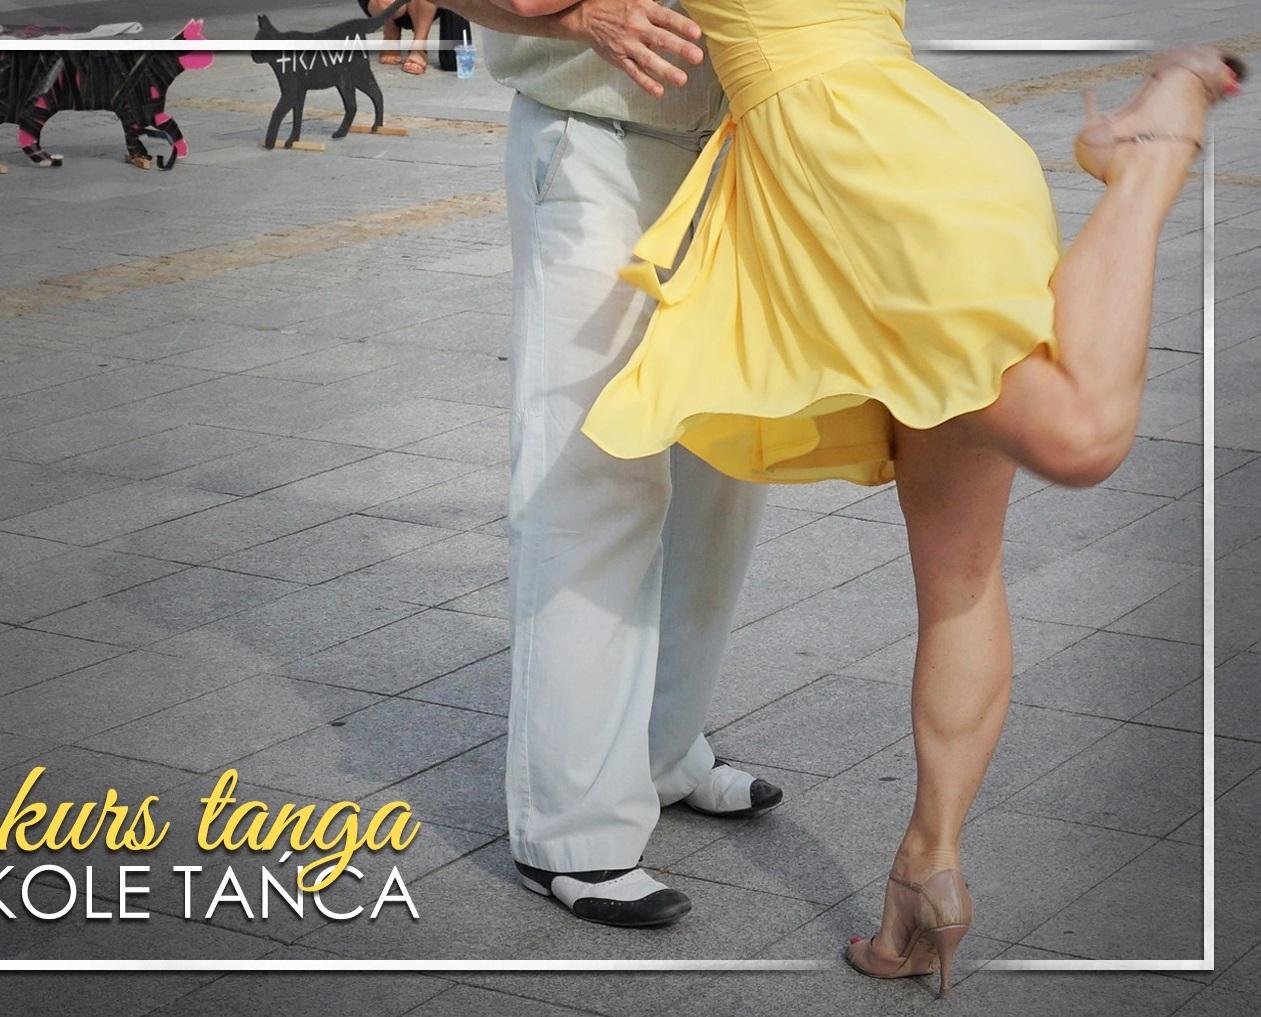 kurs tanga argentyńskiego